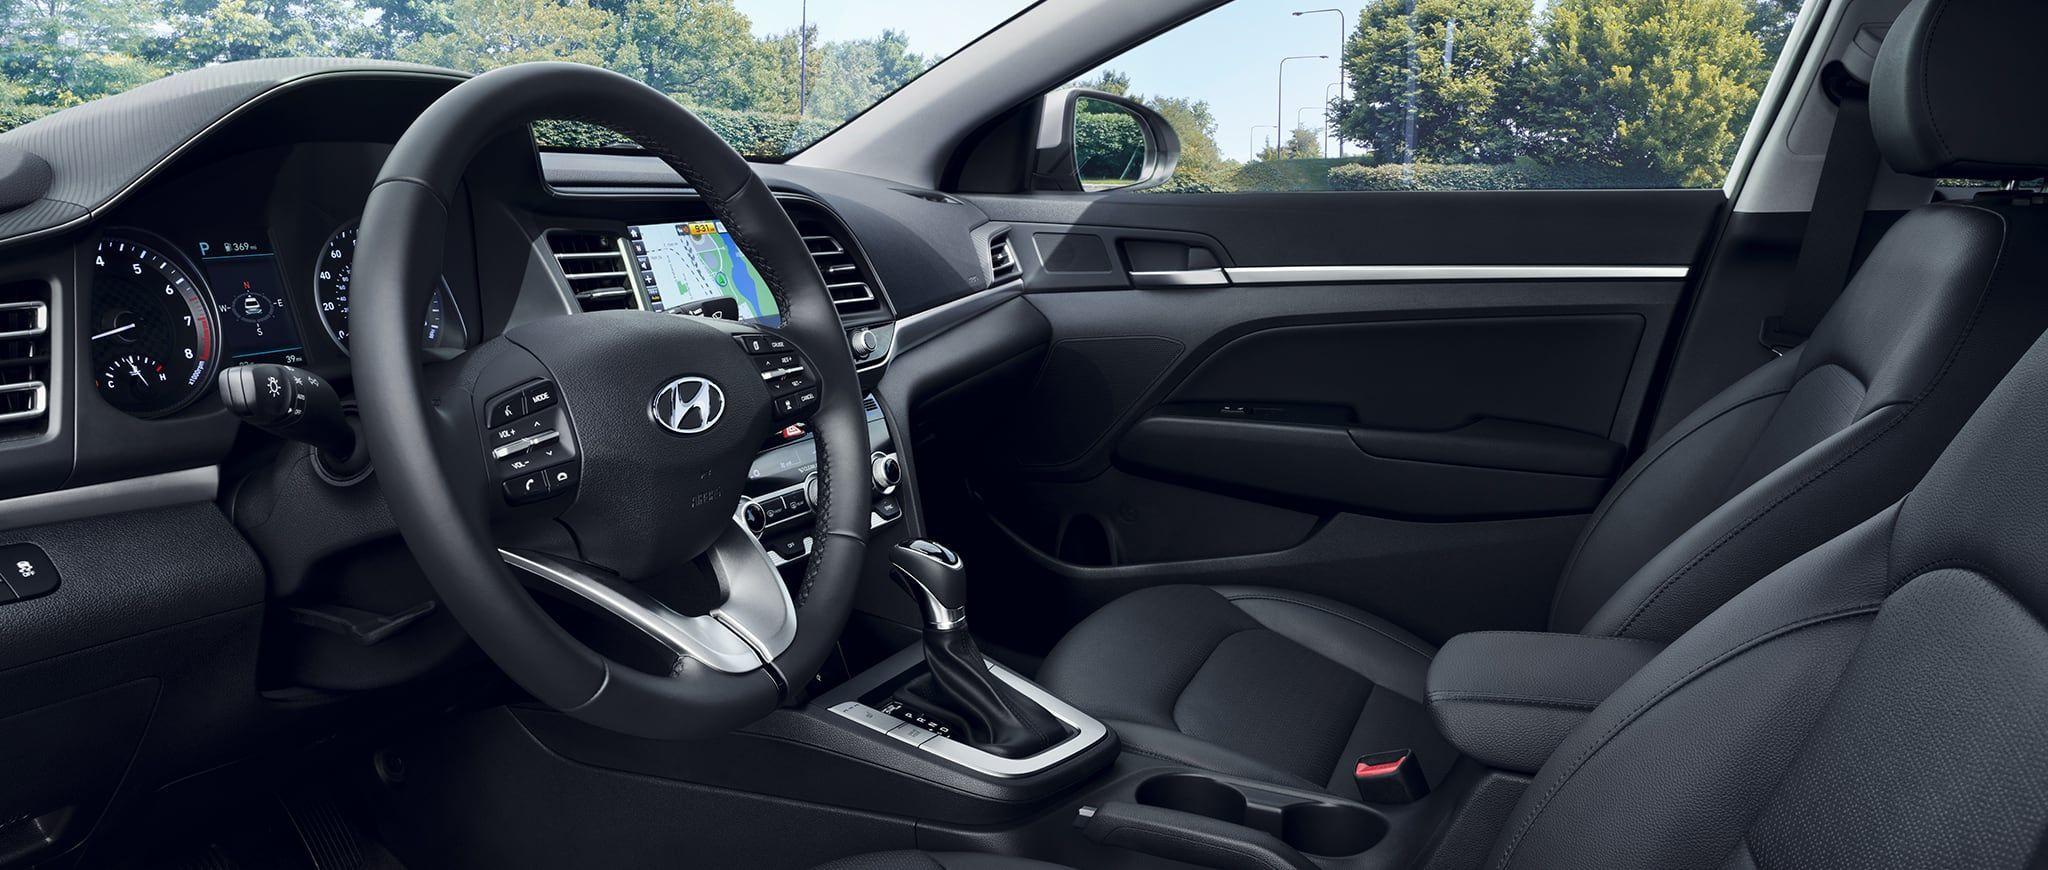 2019 Hyundai Elantra Interior View Elantra Hyundai Elantra Hyundai